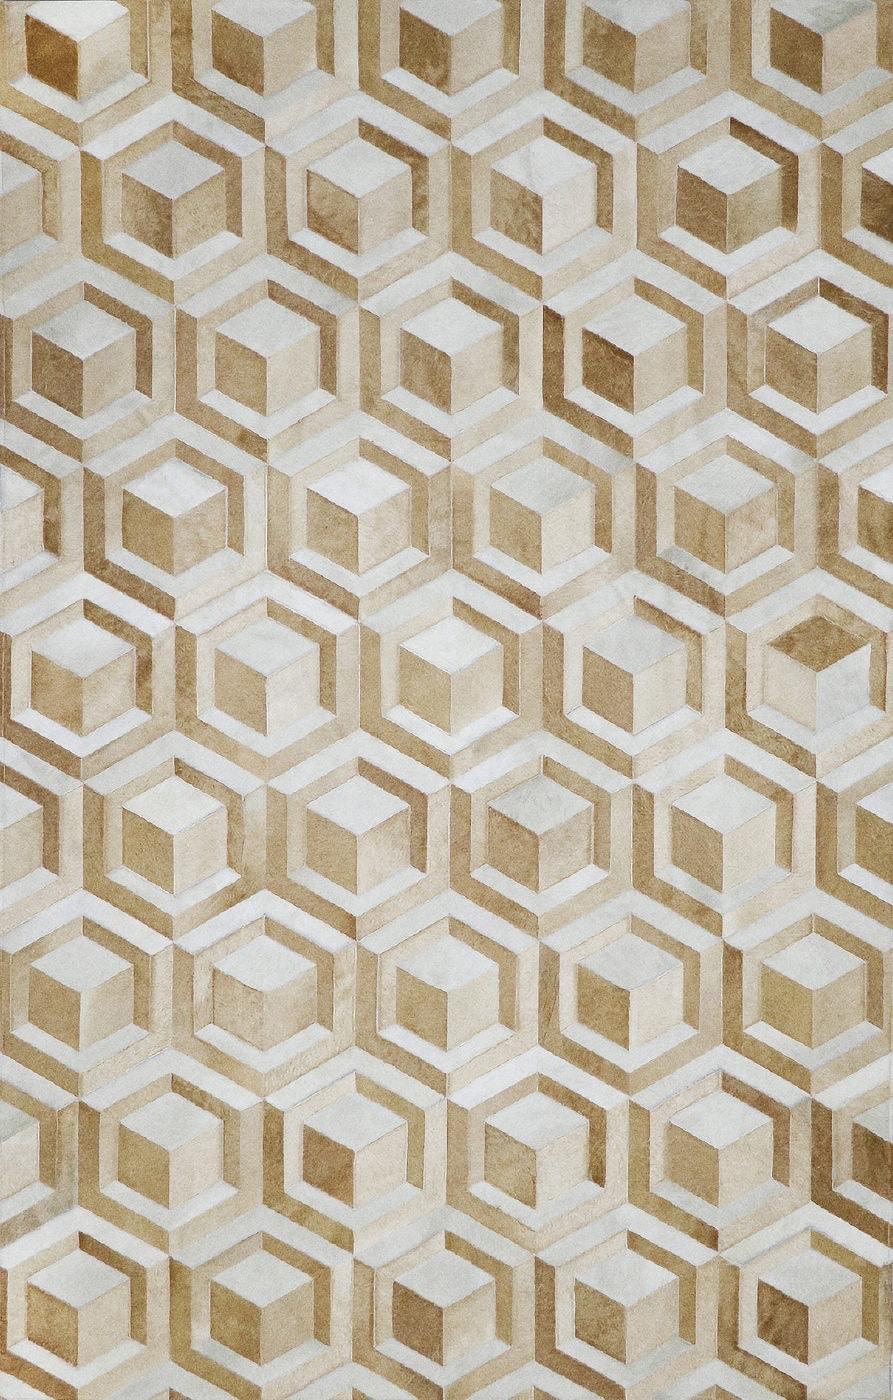 Hexagon Chai 4'x6' patchwork hair on hide rug